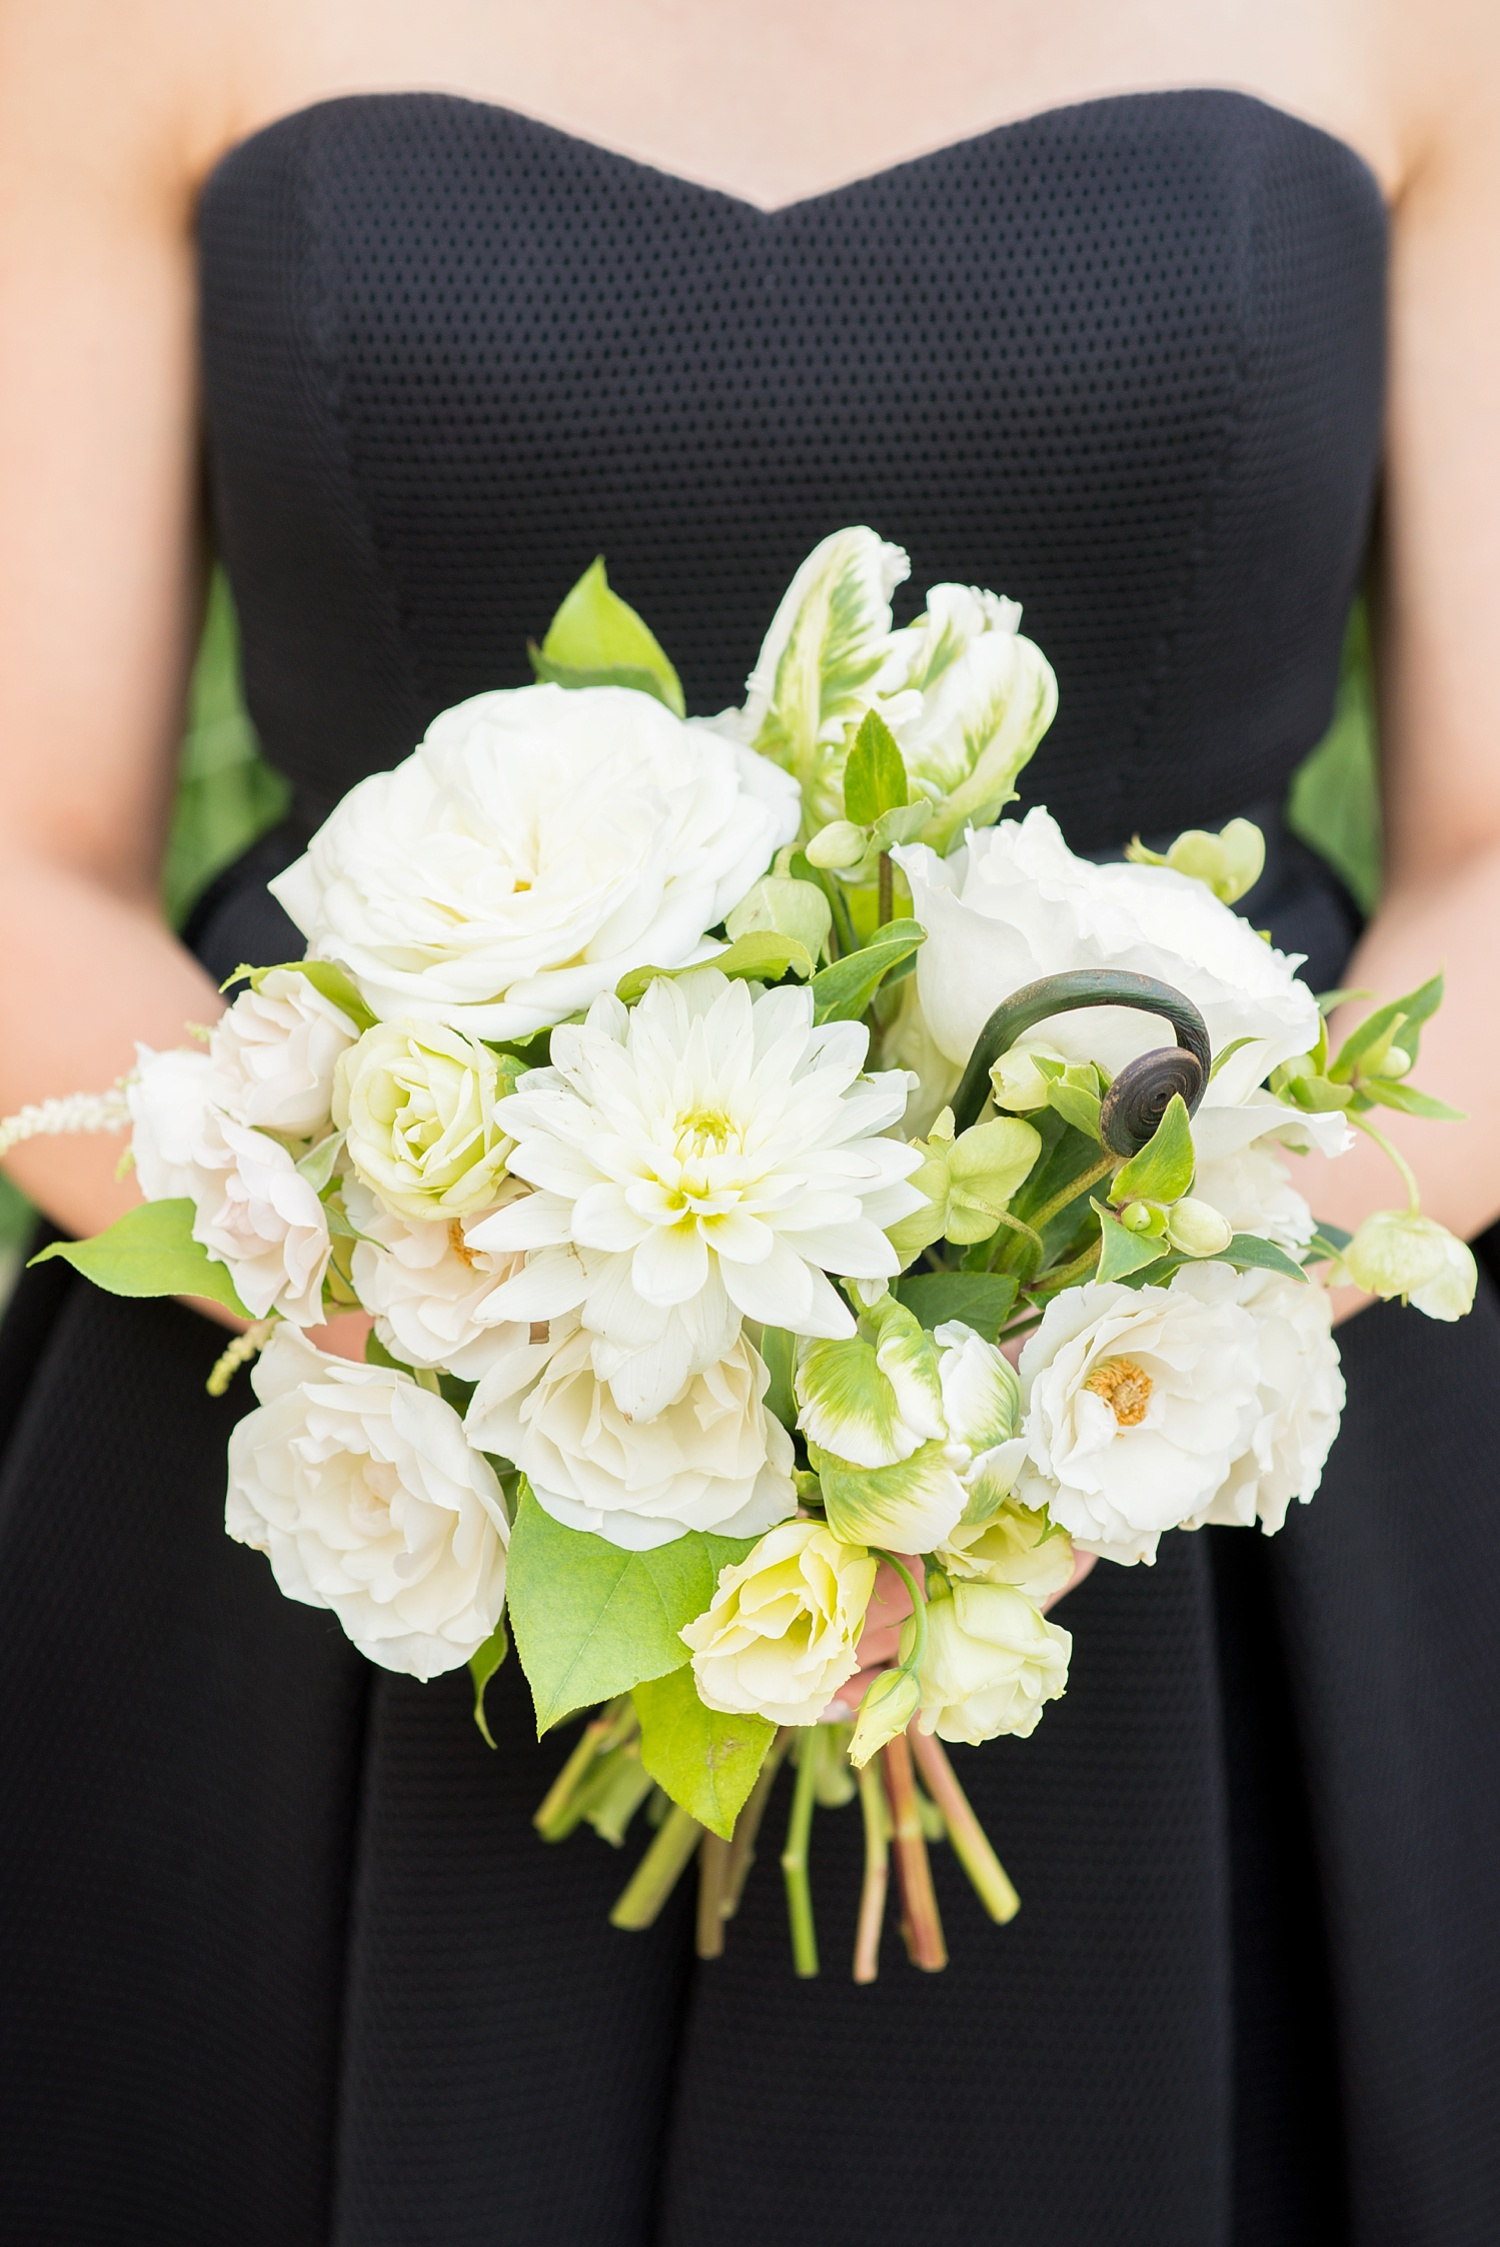 mikkelpaige-full_aperture_floral-pearl_river_hilton_wedding_0014.jpg